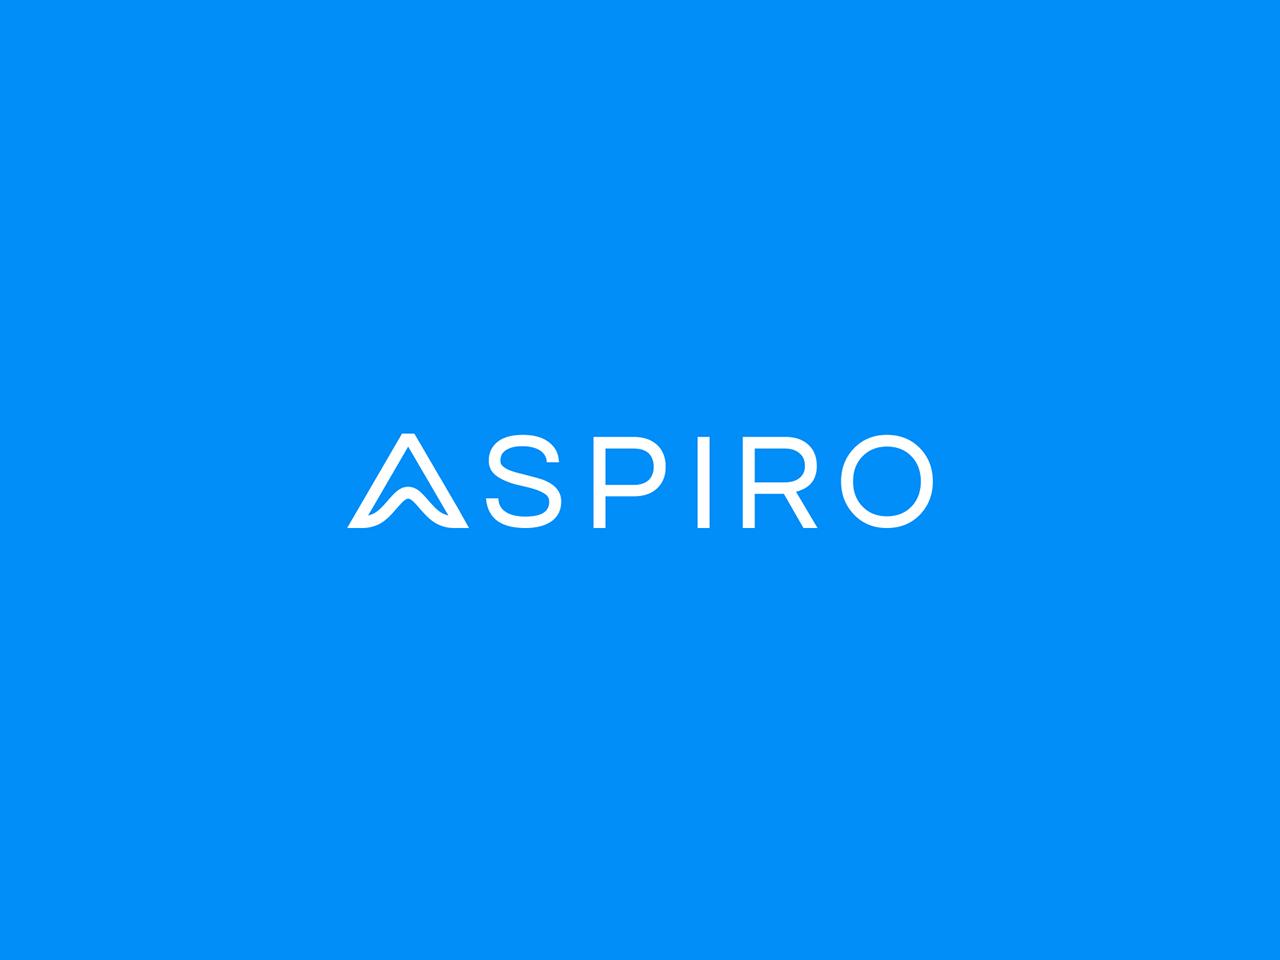 ASPIRO Logo Case Study